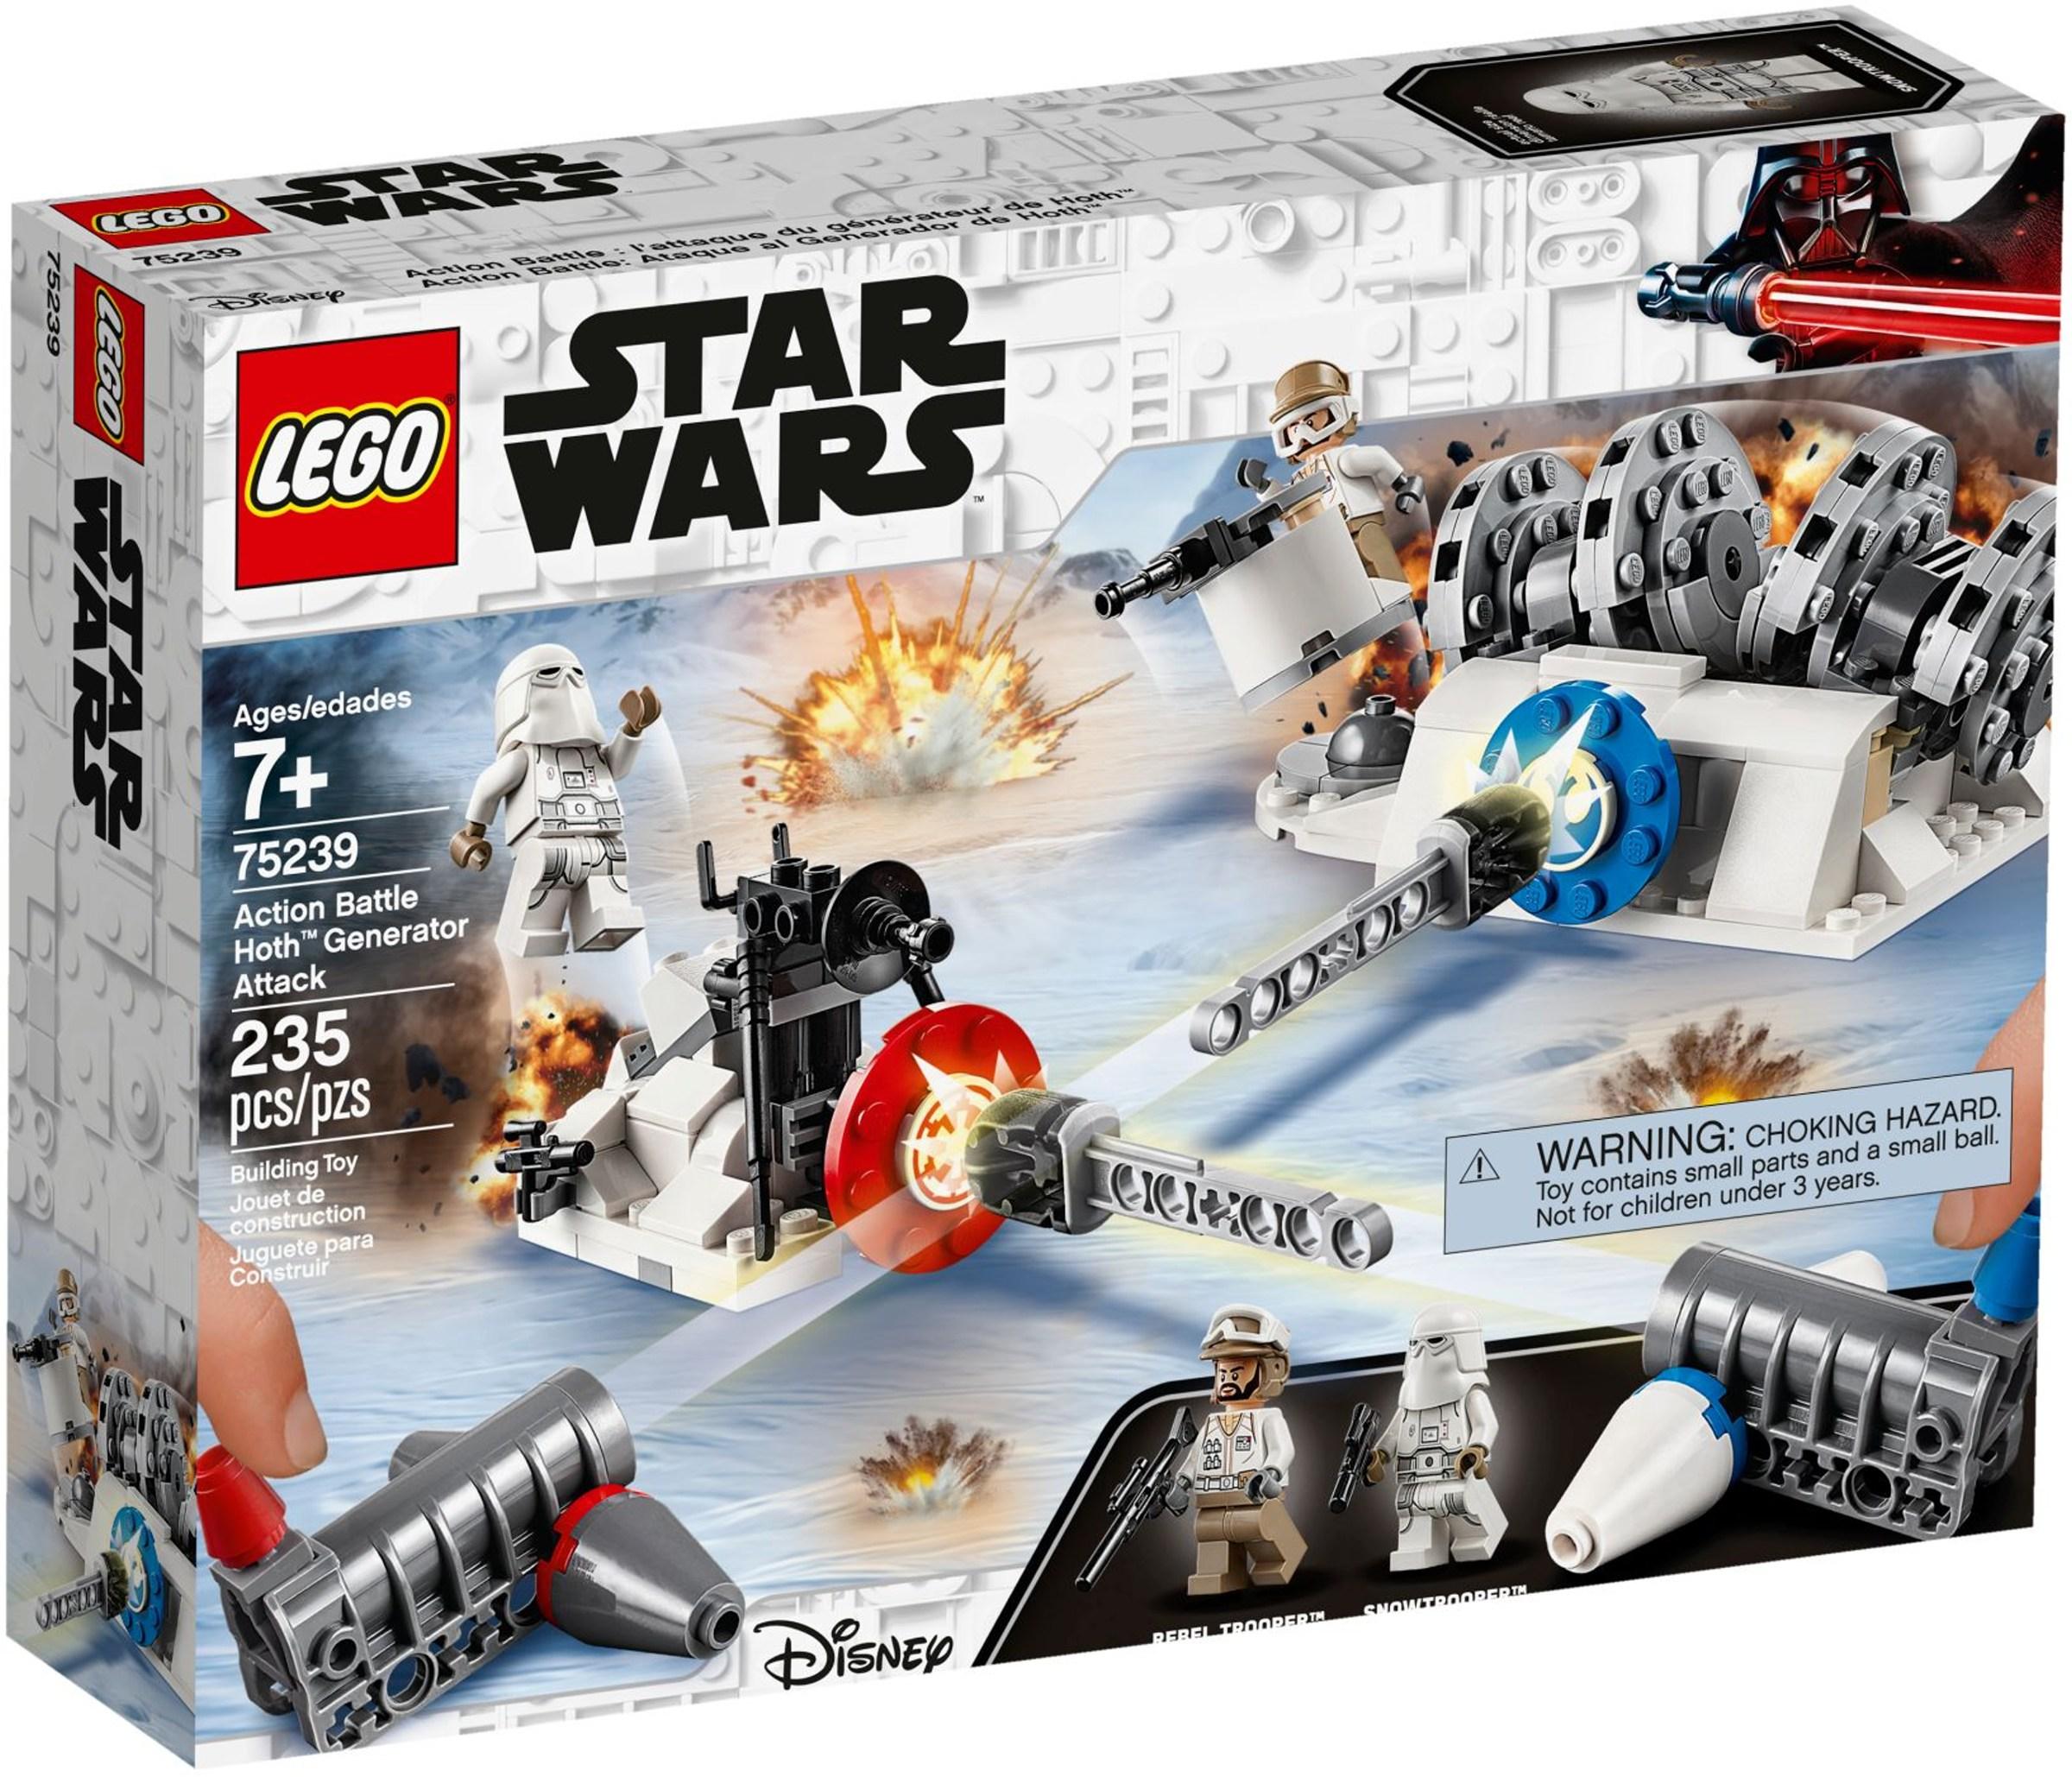 LEGO® Action Battle Hoth Generátor támadás